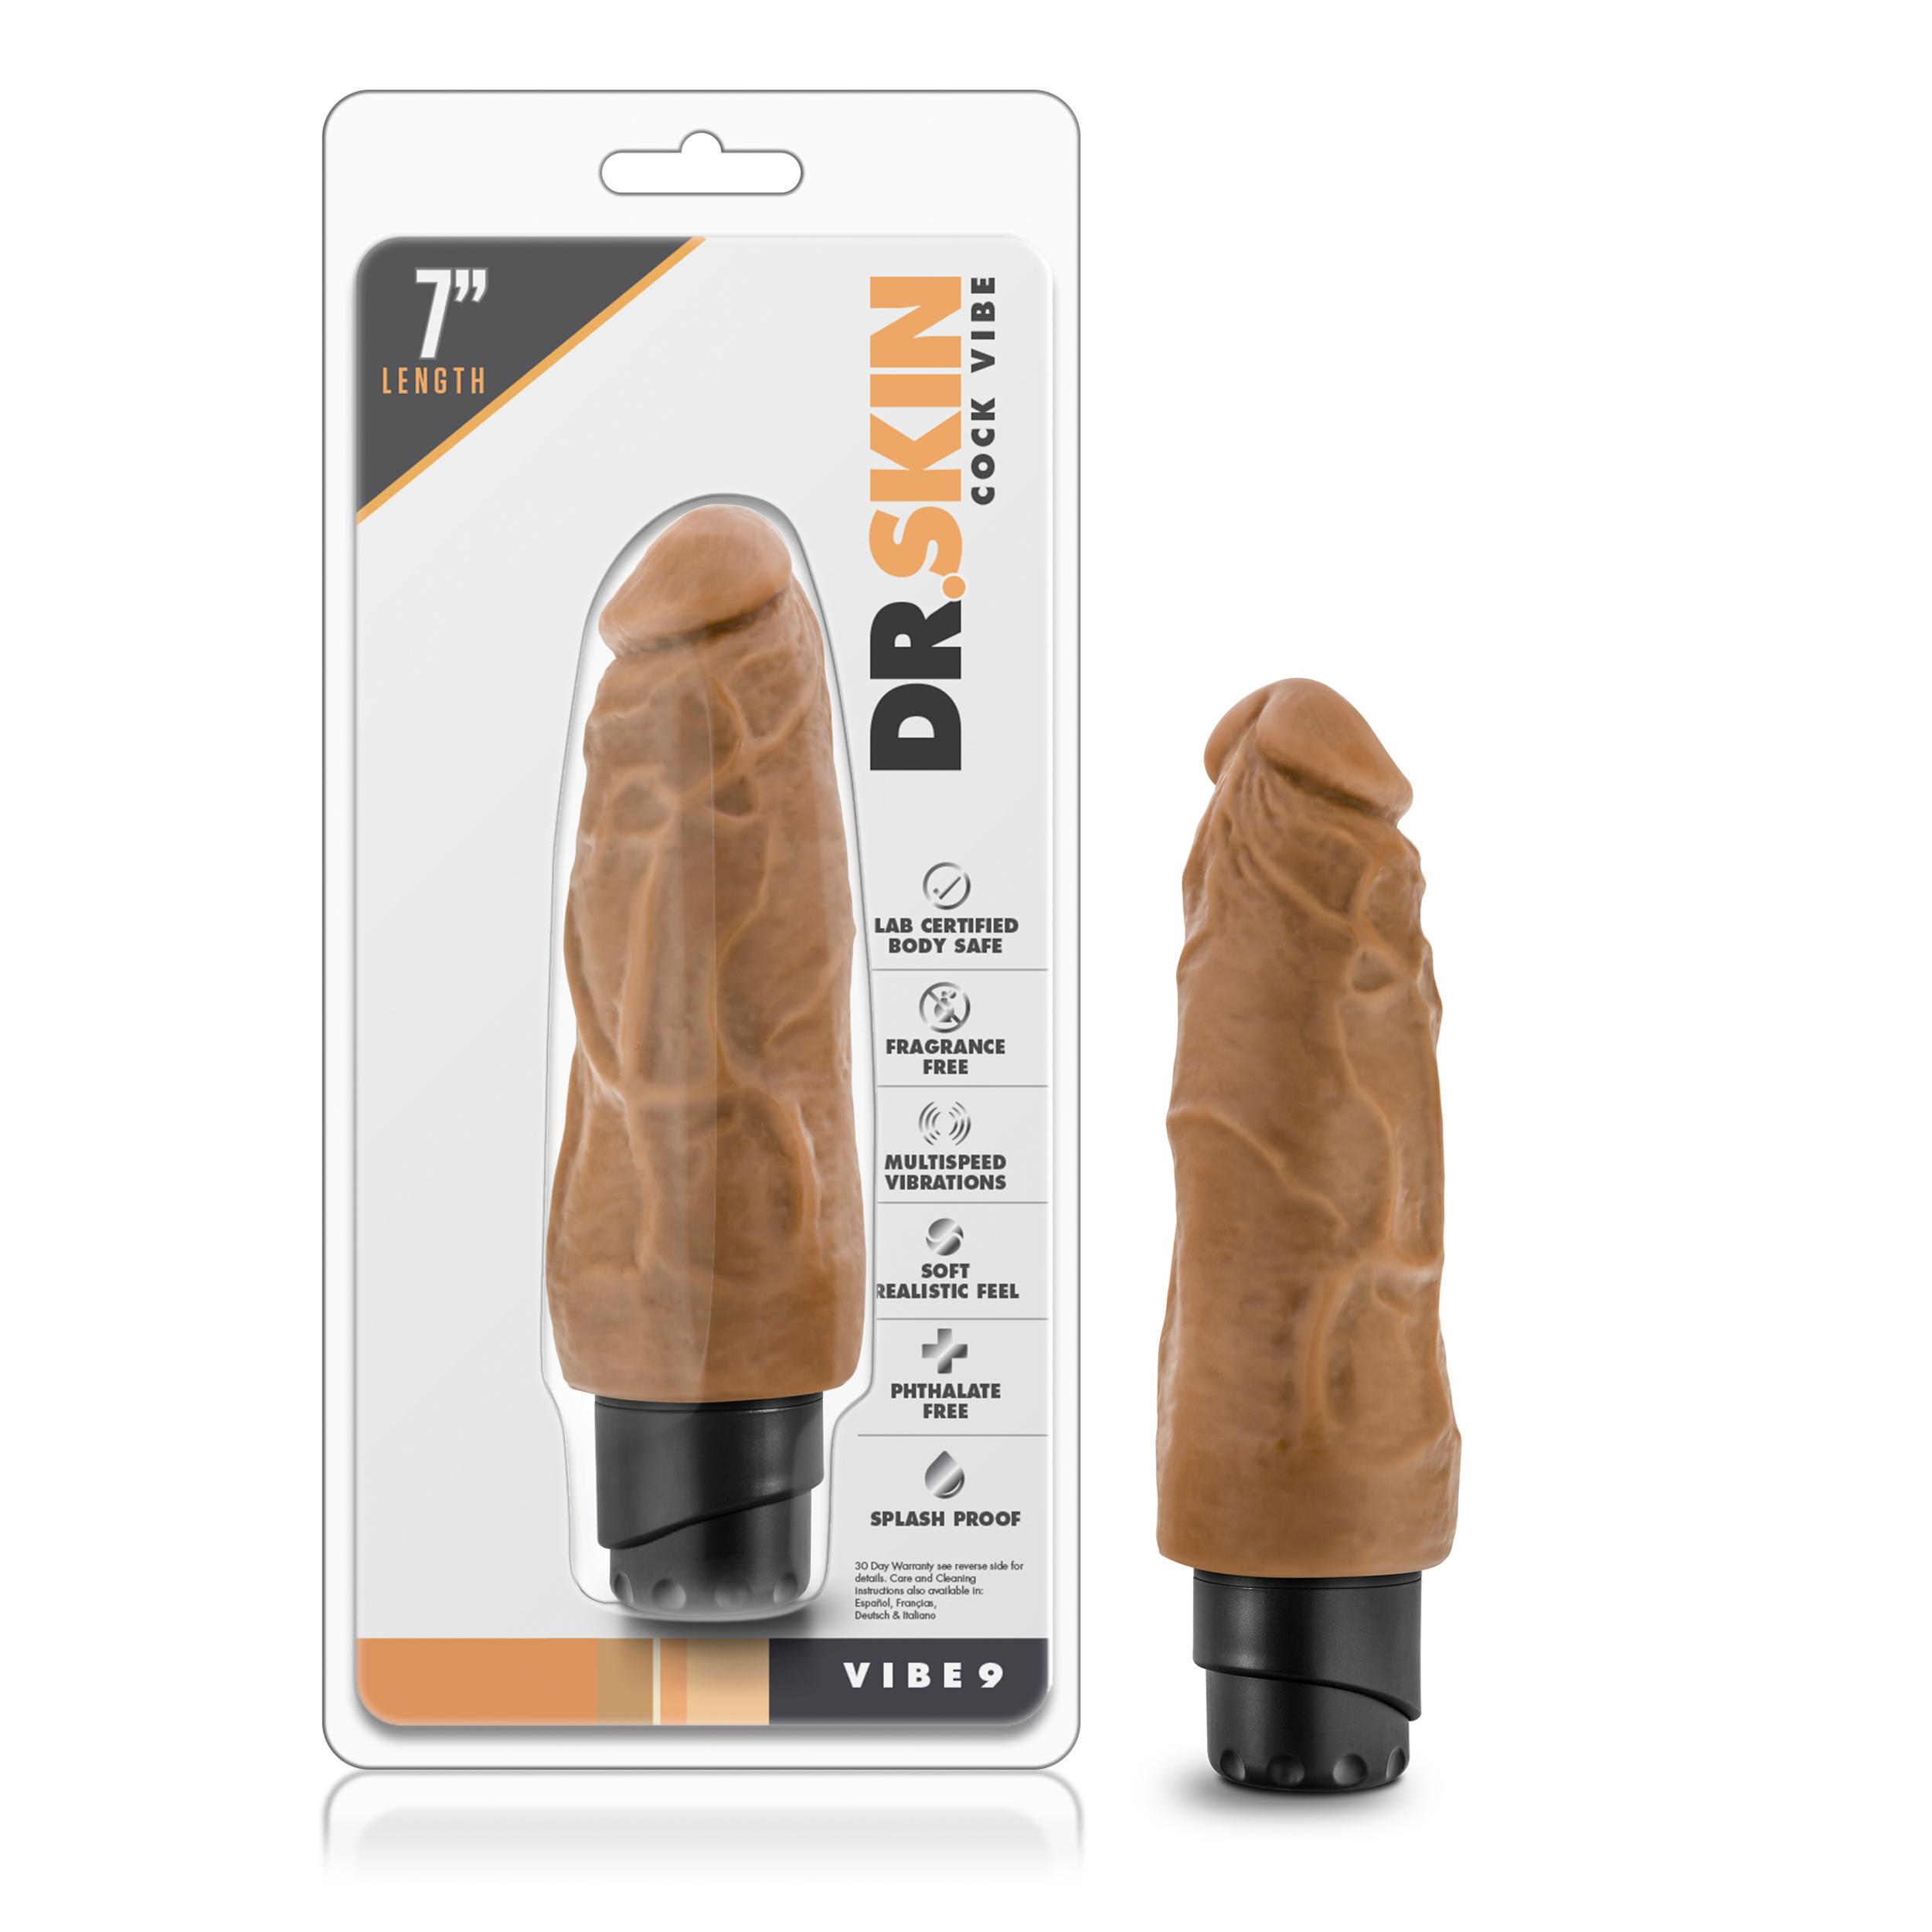 Dr. Skin - Cock Vibe 9 - 7.5 inch vibrating cock - Mocha